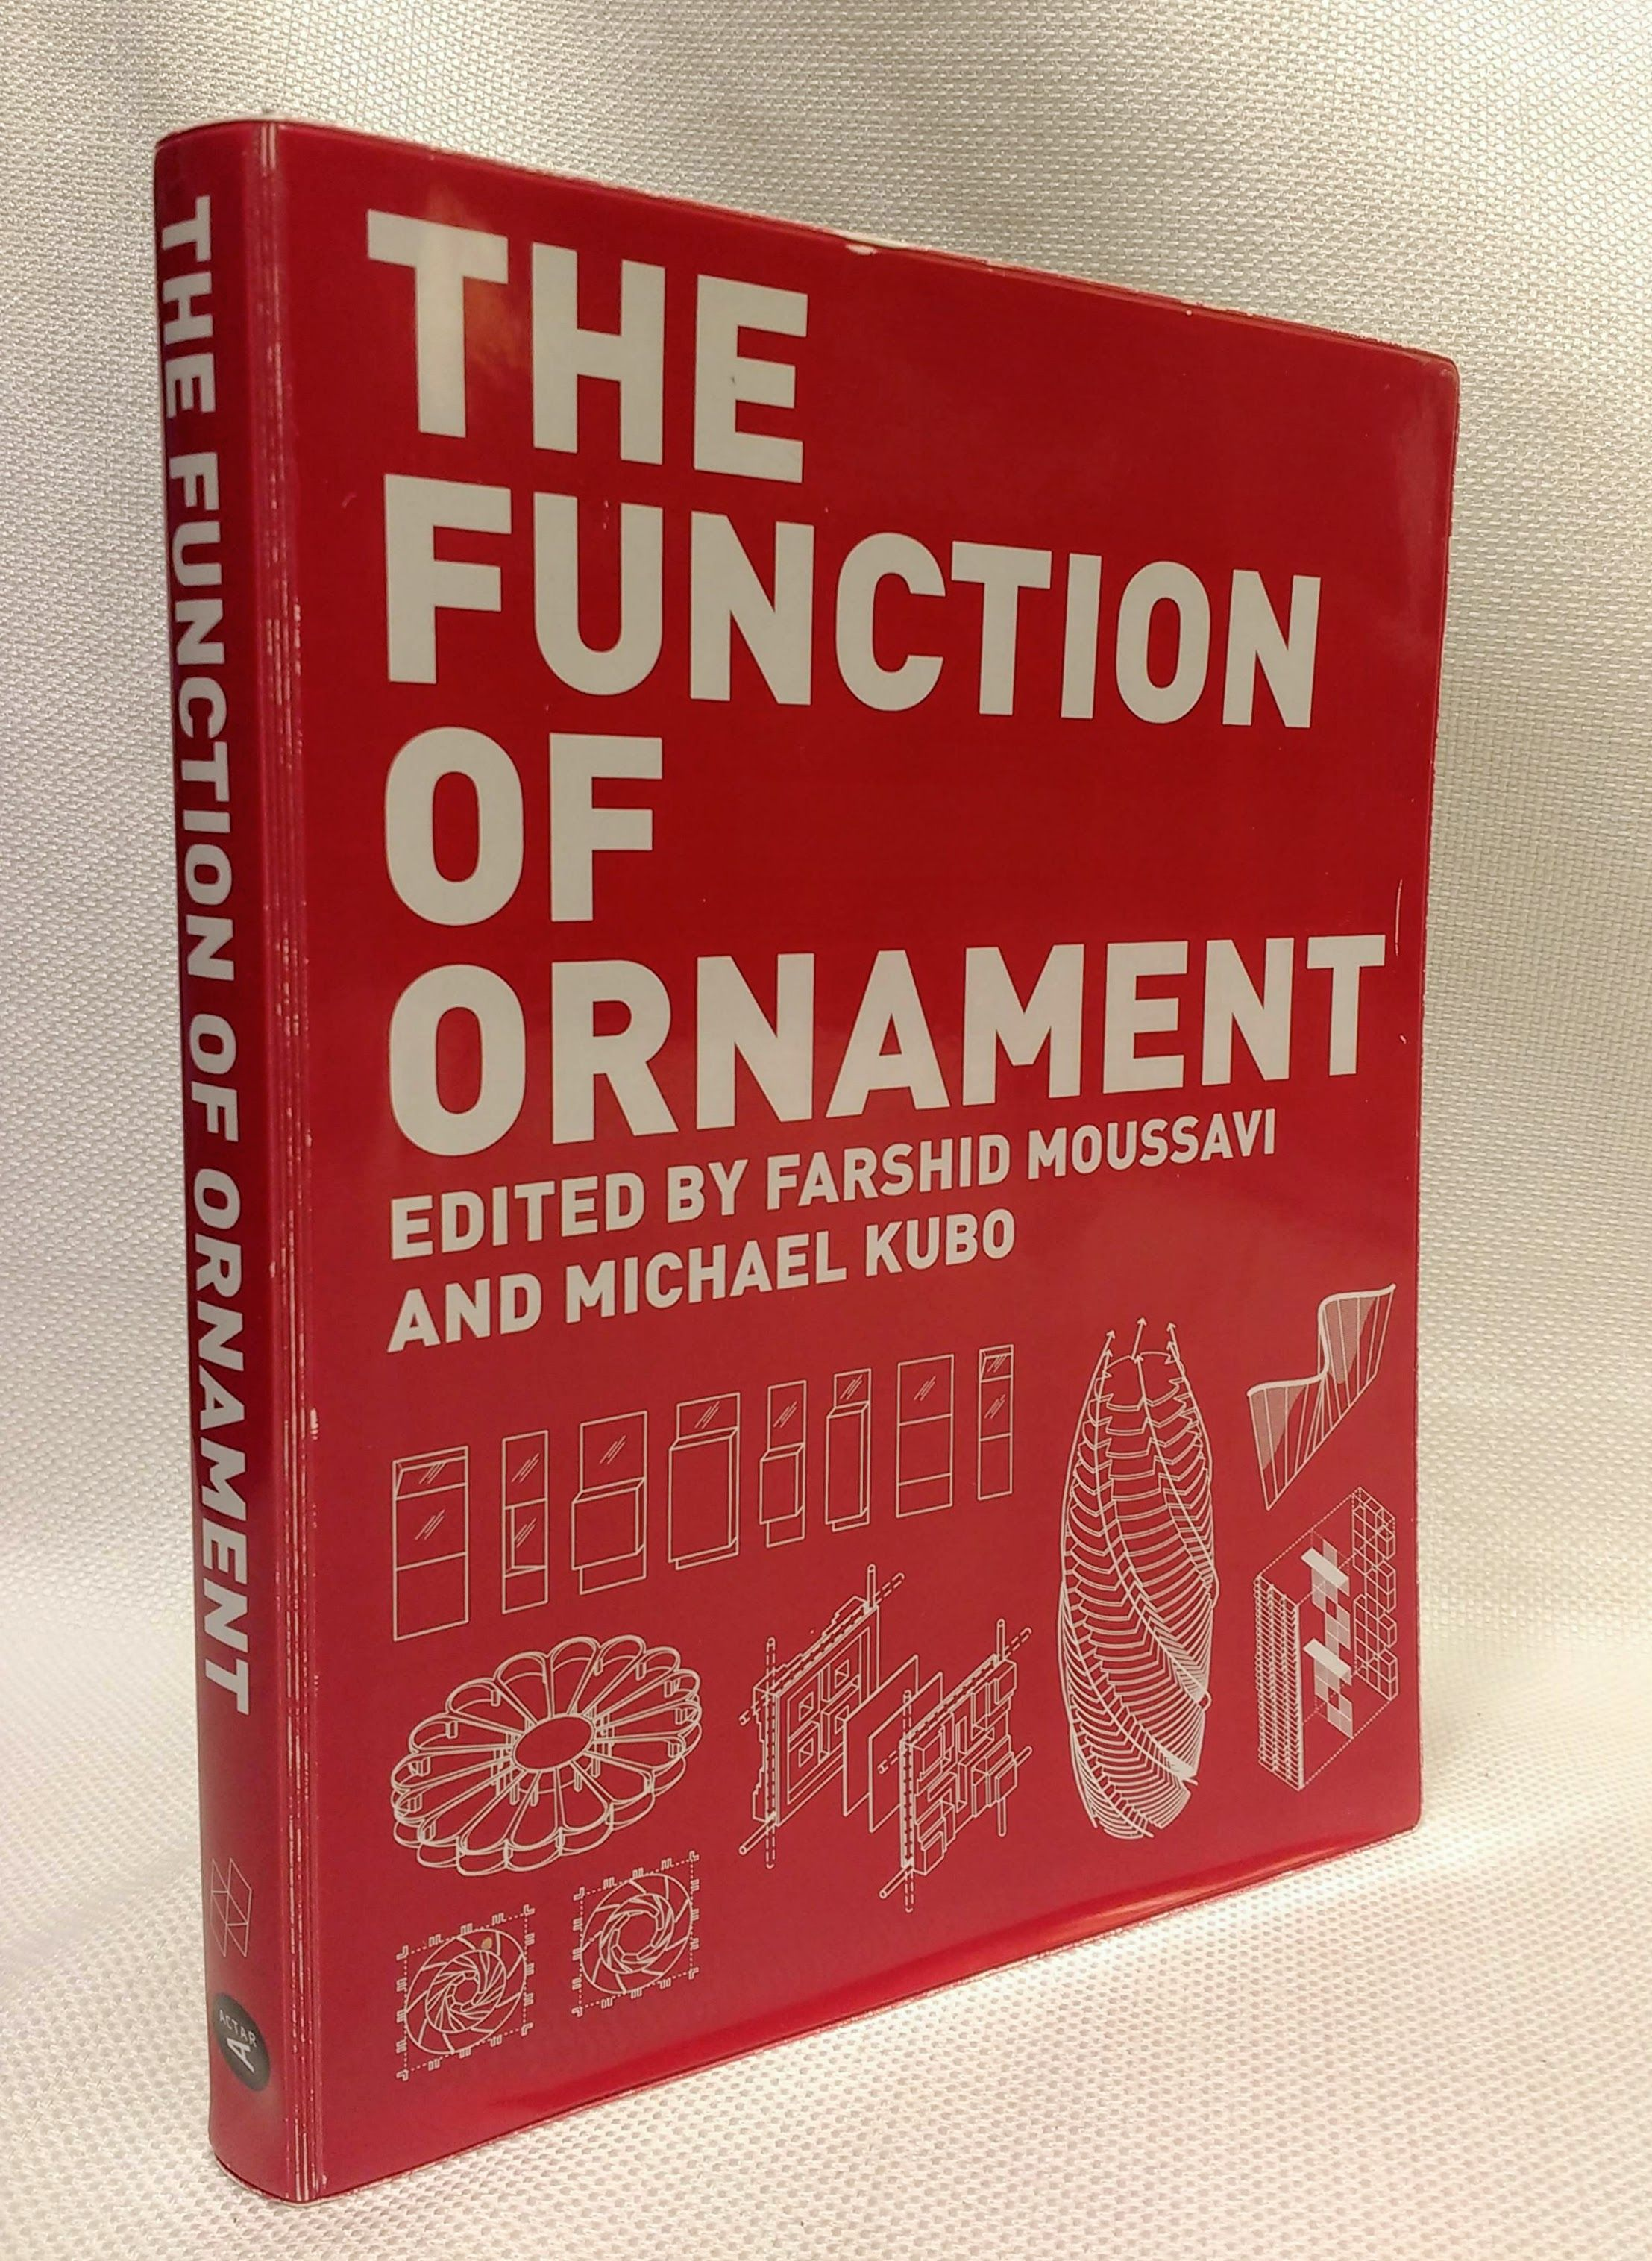 The Function of Ornament, Moussavi, Farshid; Kubo, Michael [Editor]; Harvard Graduate School of Design [Editor];